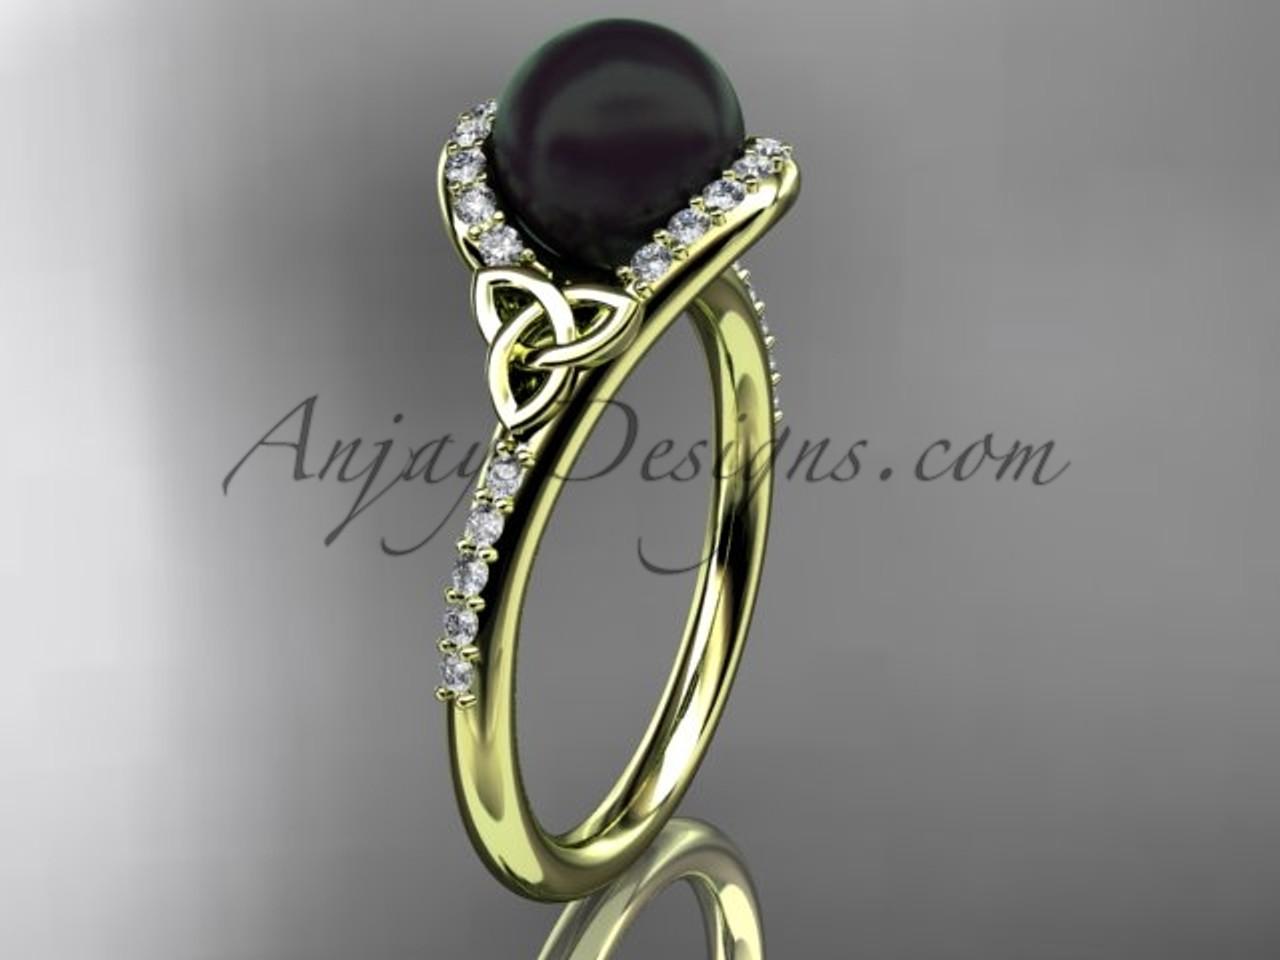 irish black cultured pearl engagement rings 14kt yellow gold diamond celtic trinity knot wedding ring ctbp7317 - Pearl Wedding Rings